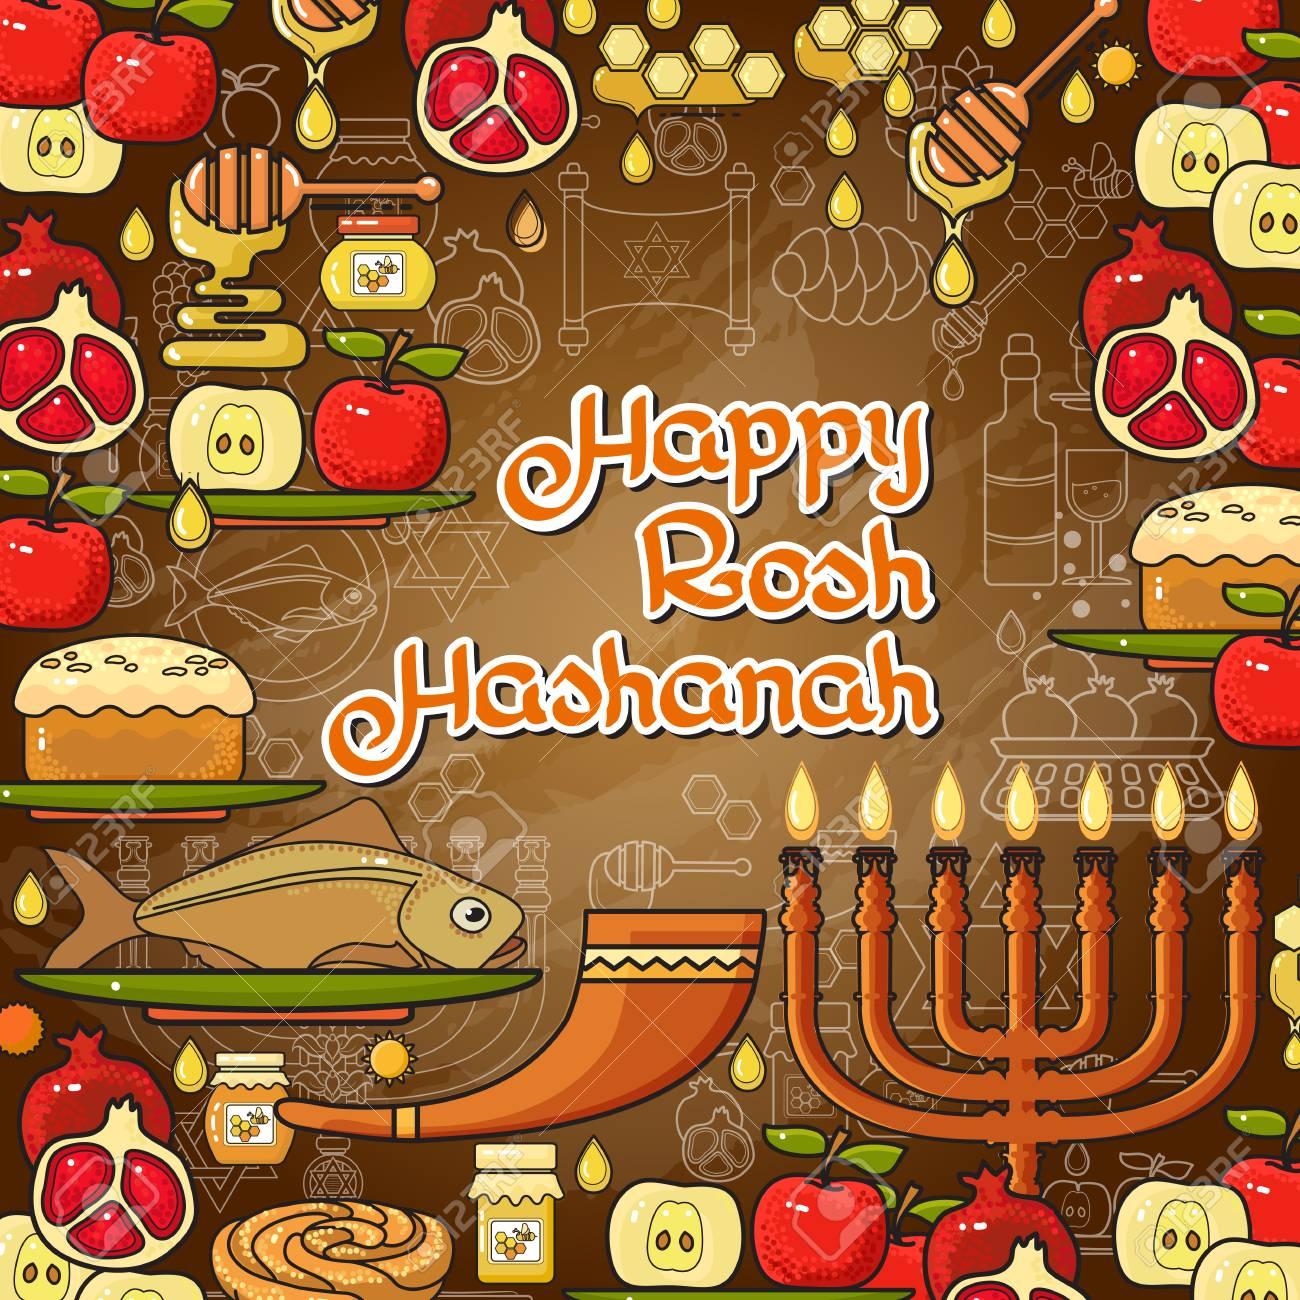 Happy Rosh Hashanah Card Jewish Holiday Design Elements Royalty